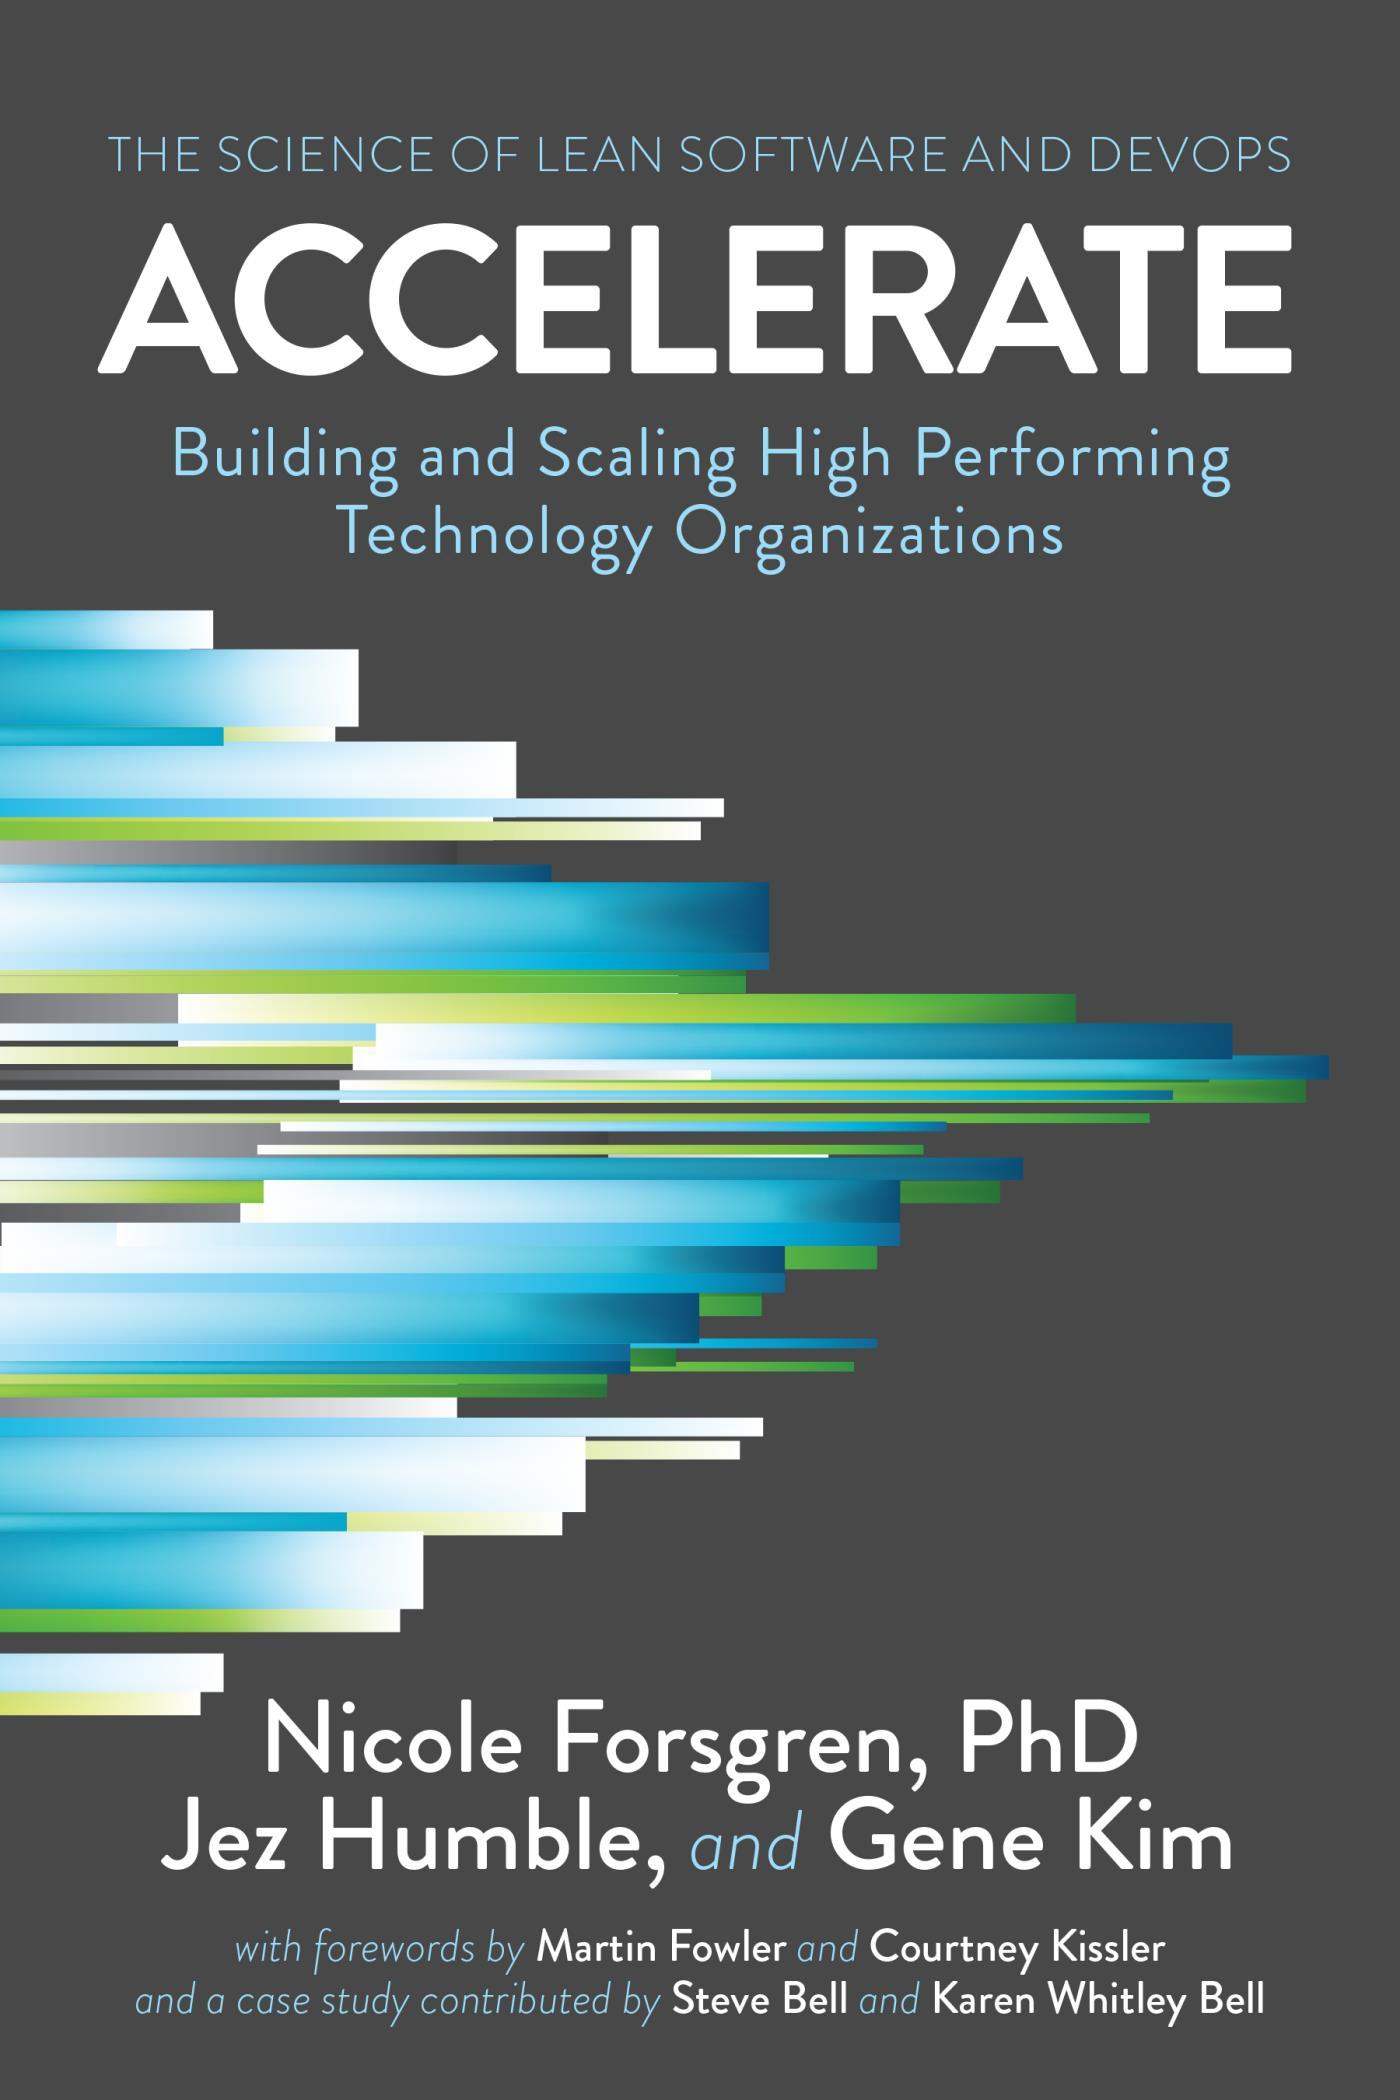 Download Ebook Accelerate by Forsgren, PhD, Nicole Pdf